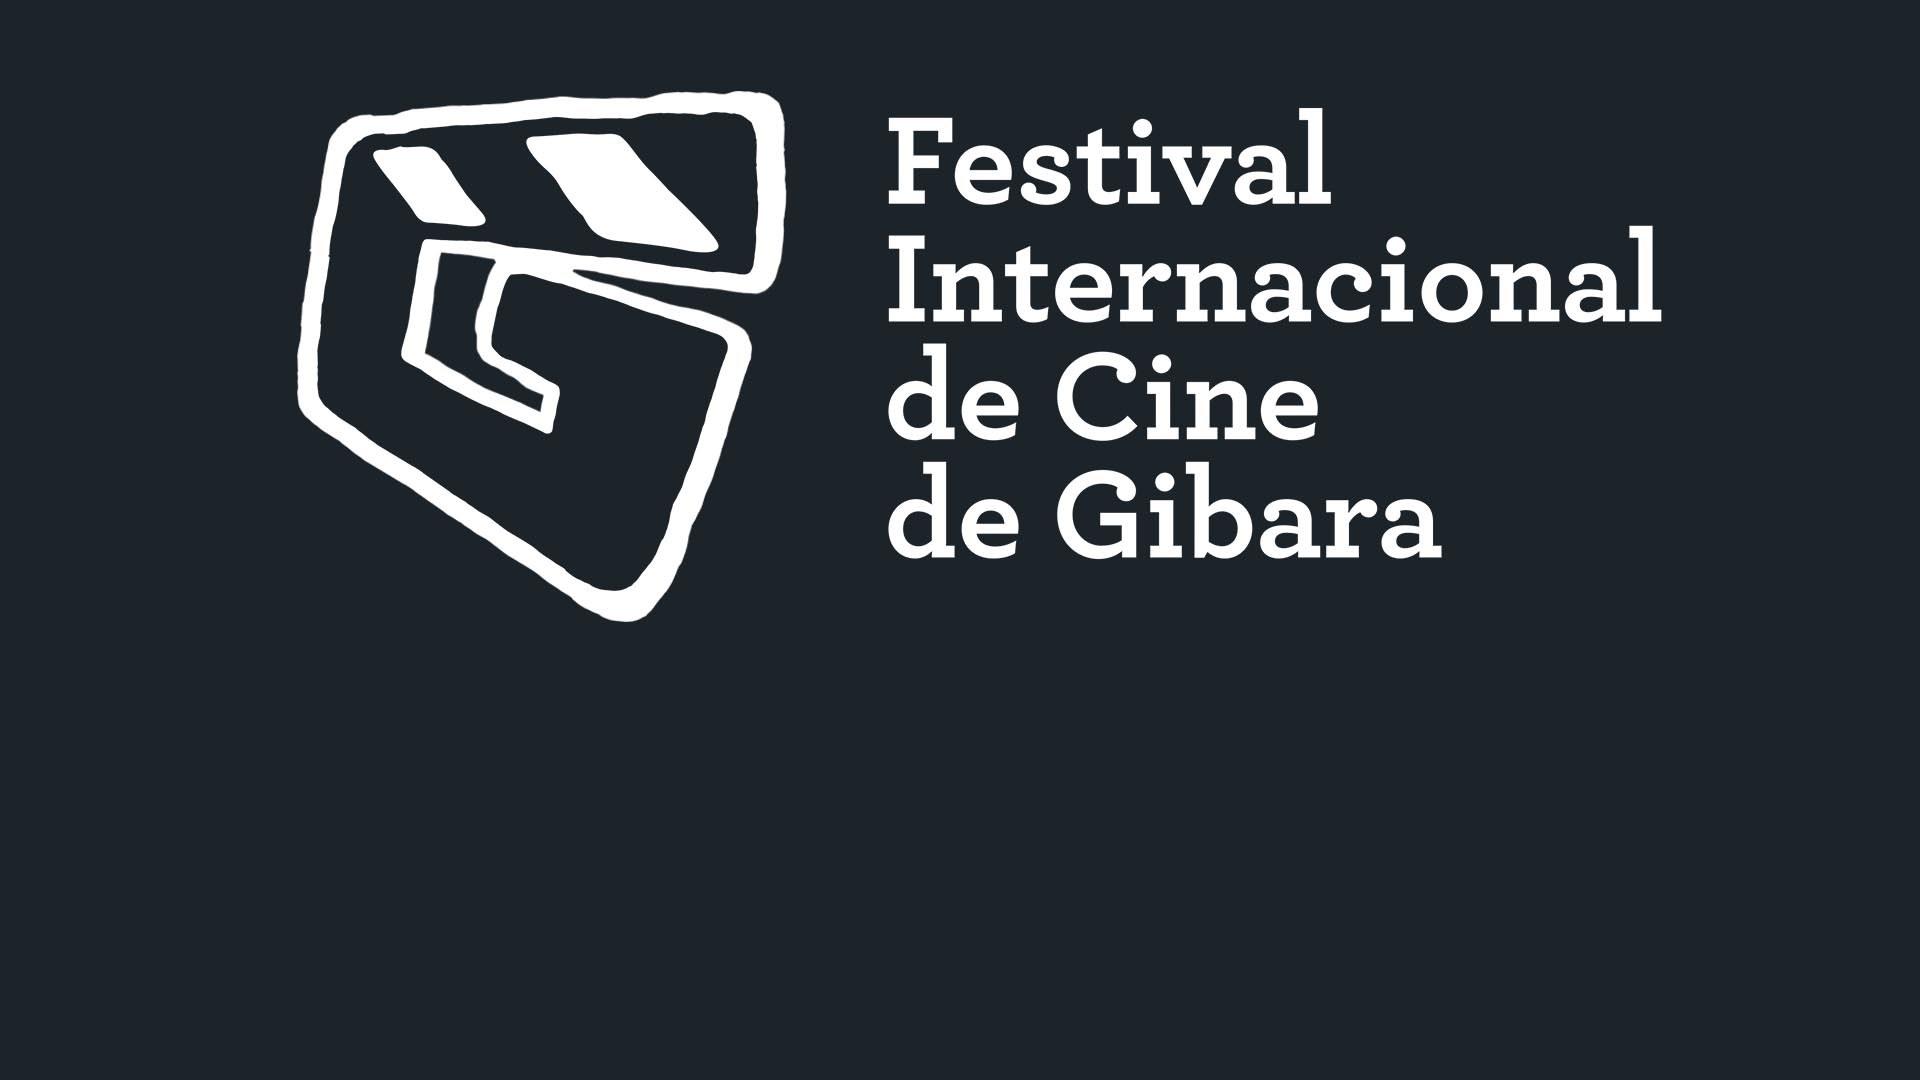 Resultado de imagen para site:www.acn.cu Festival Internacional de Cine de Gibara